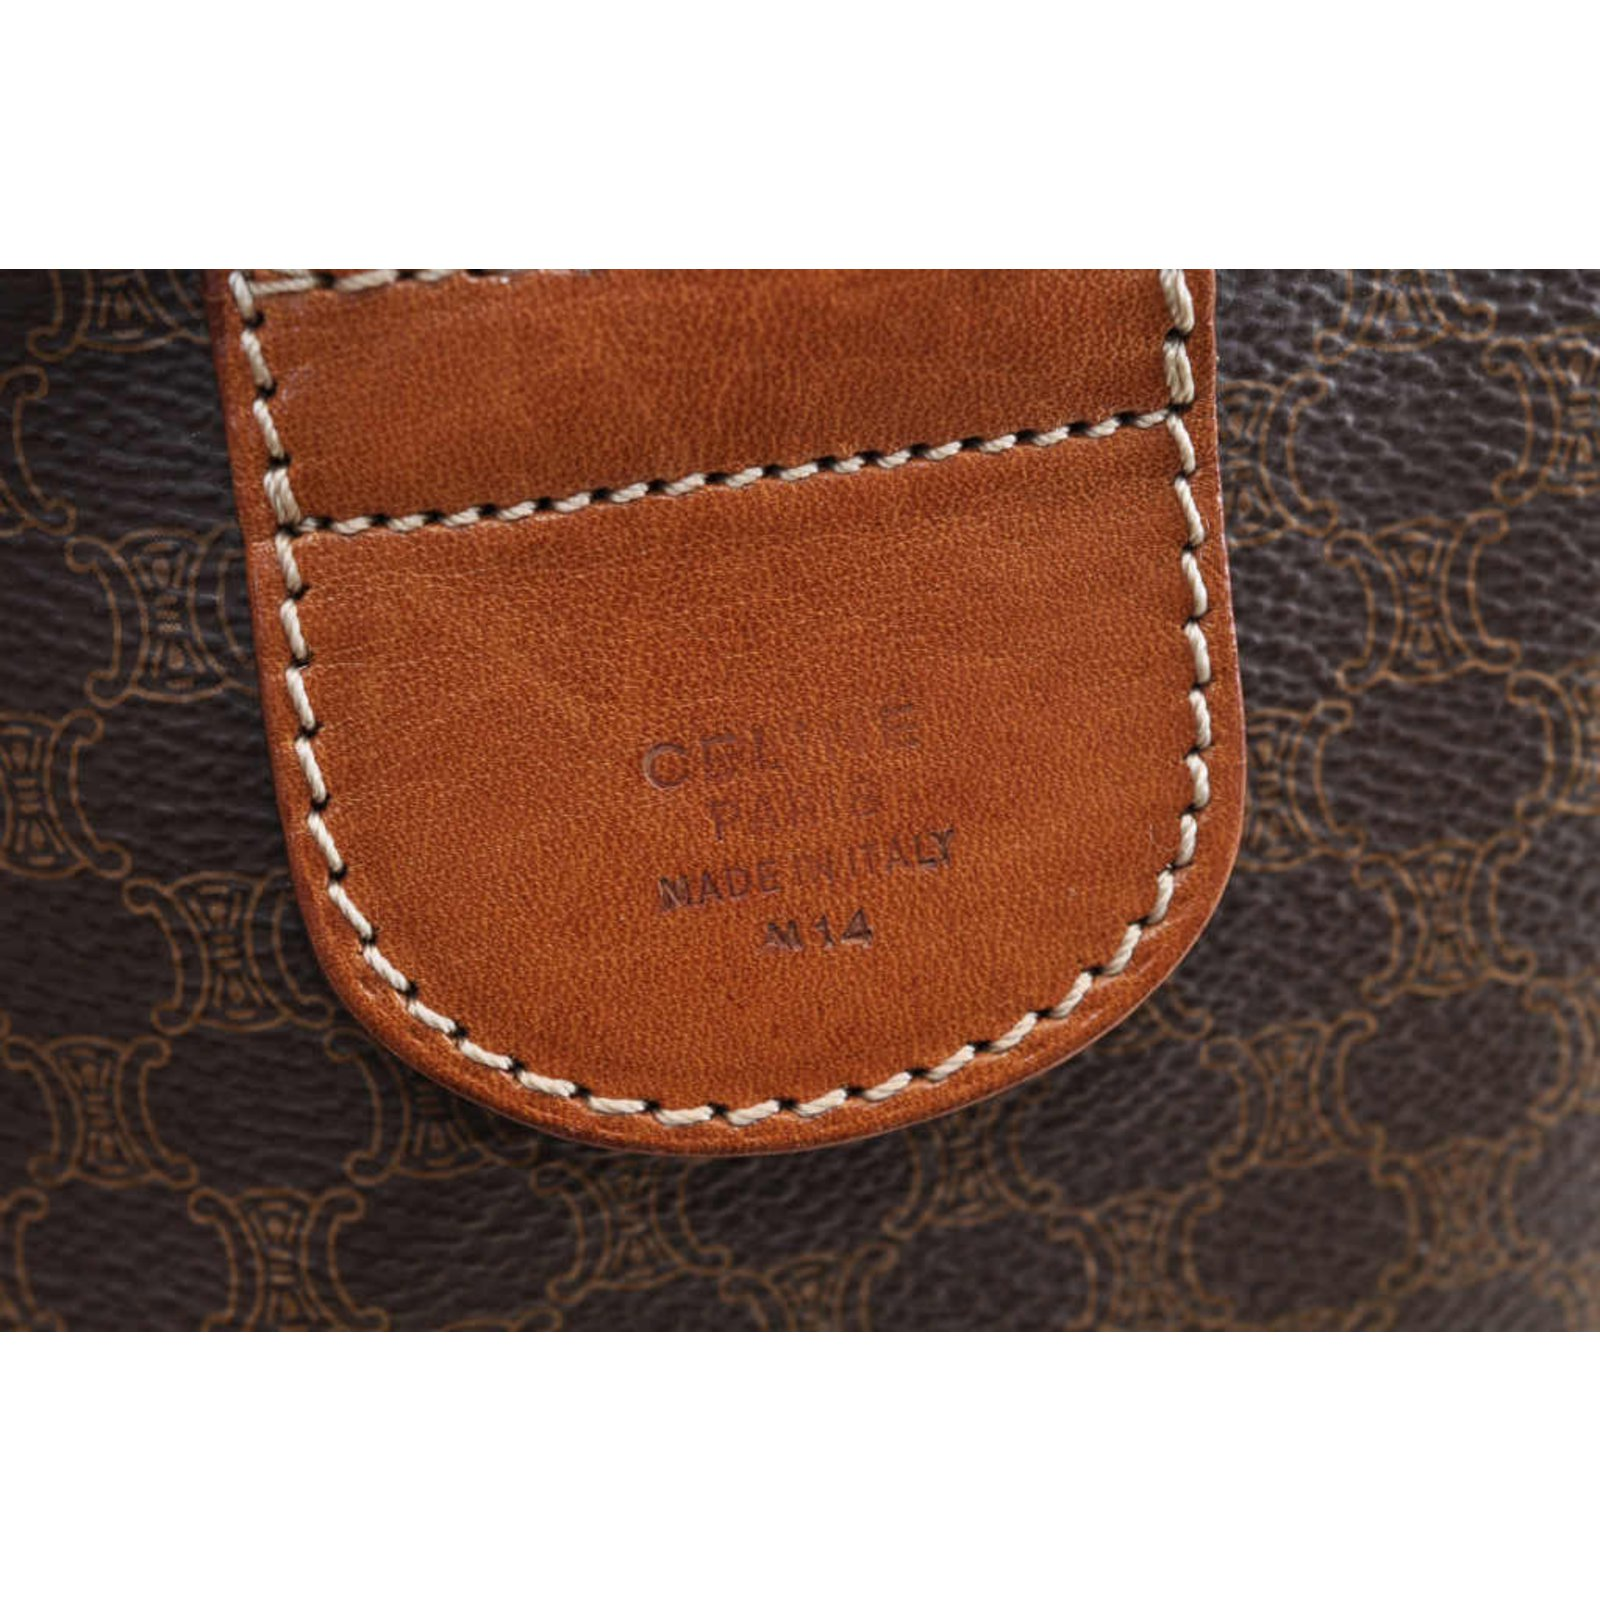 70a4dbda3f40 Céline Celine Boston Bag Handbags Other Brown ref.104304 - Joli Closet